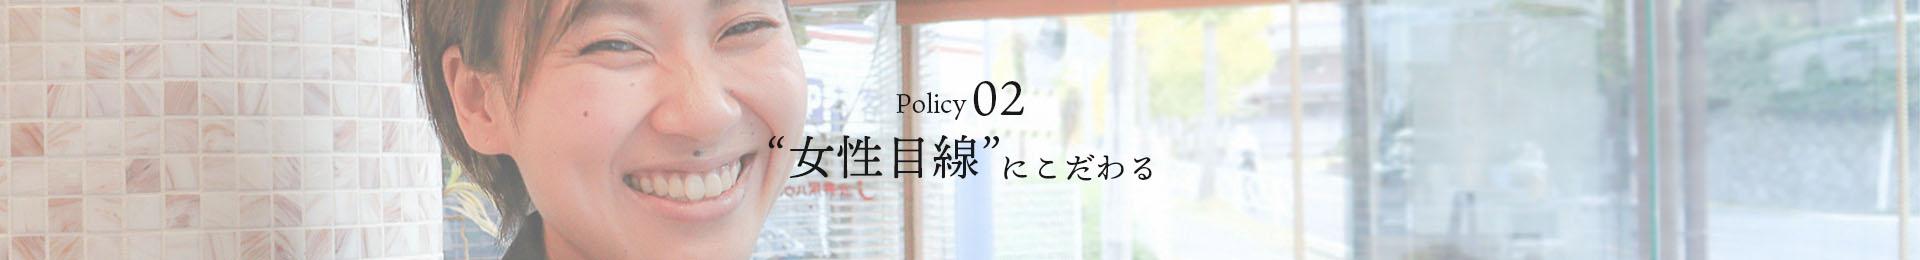 policy02「女性目線」にこだわる